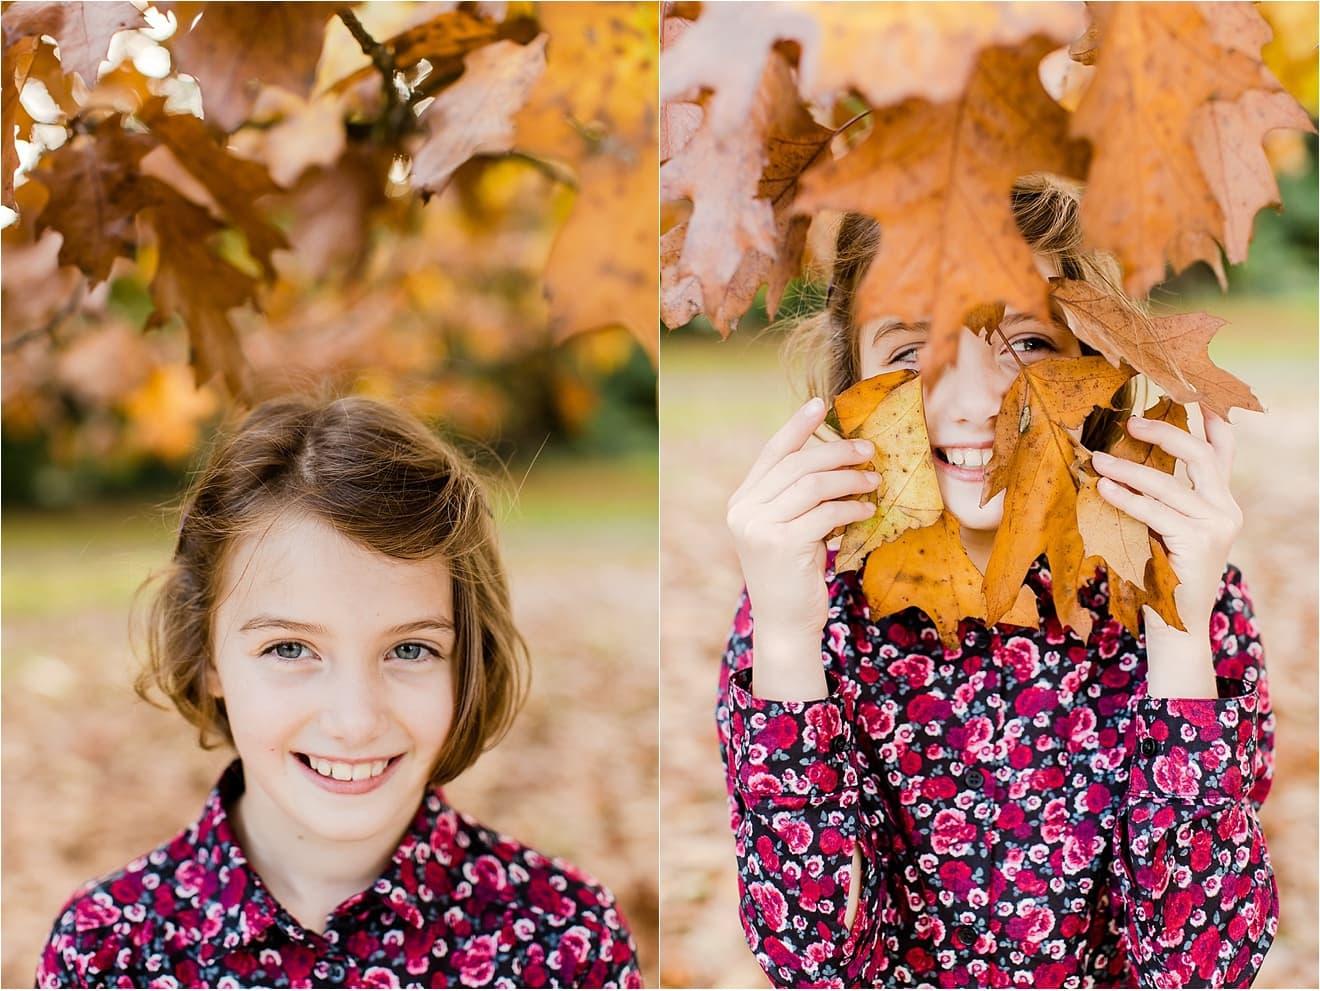 032_family-photography-surrey-autumn-mini-session-eddie-judd-photographer_9786